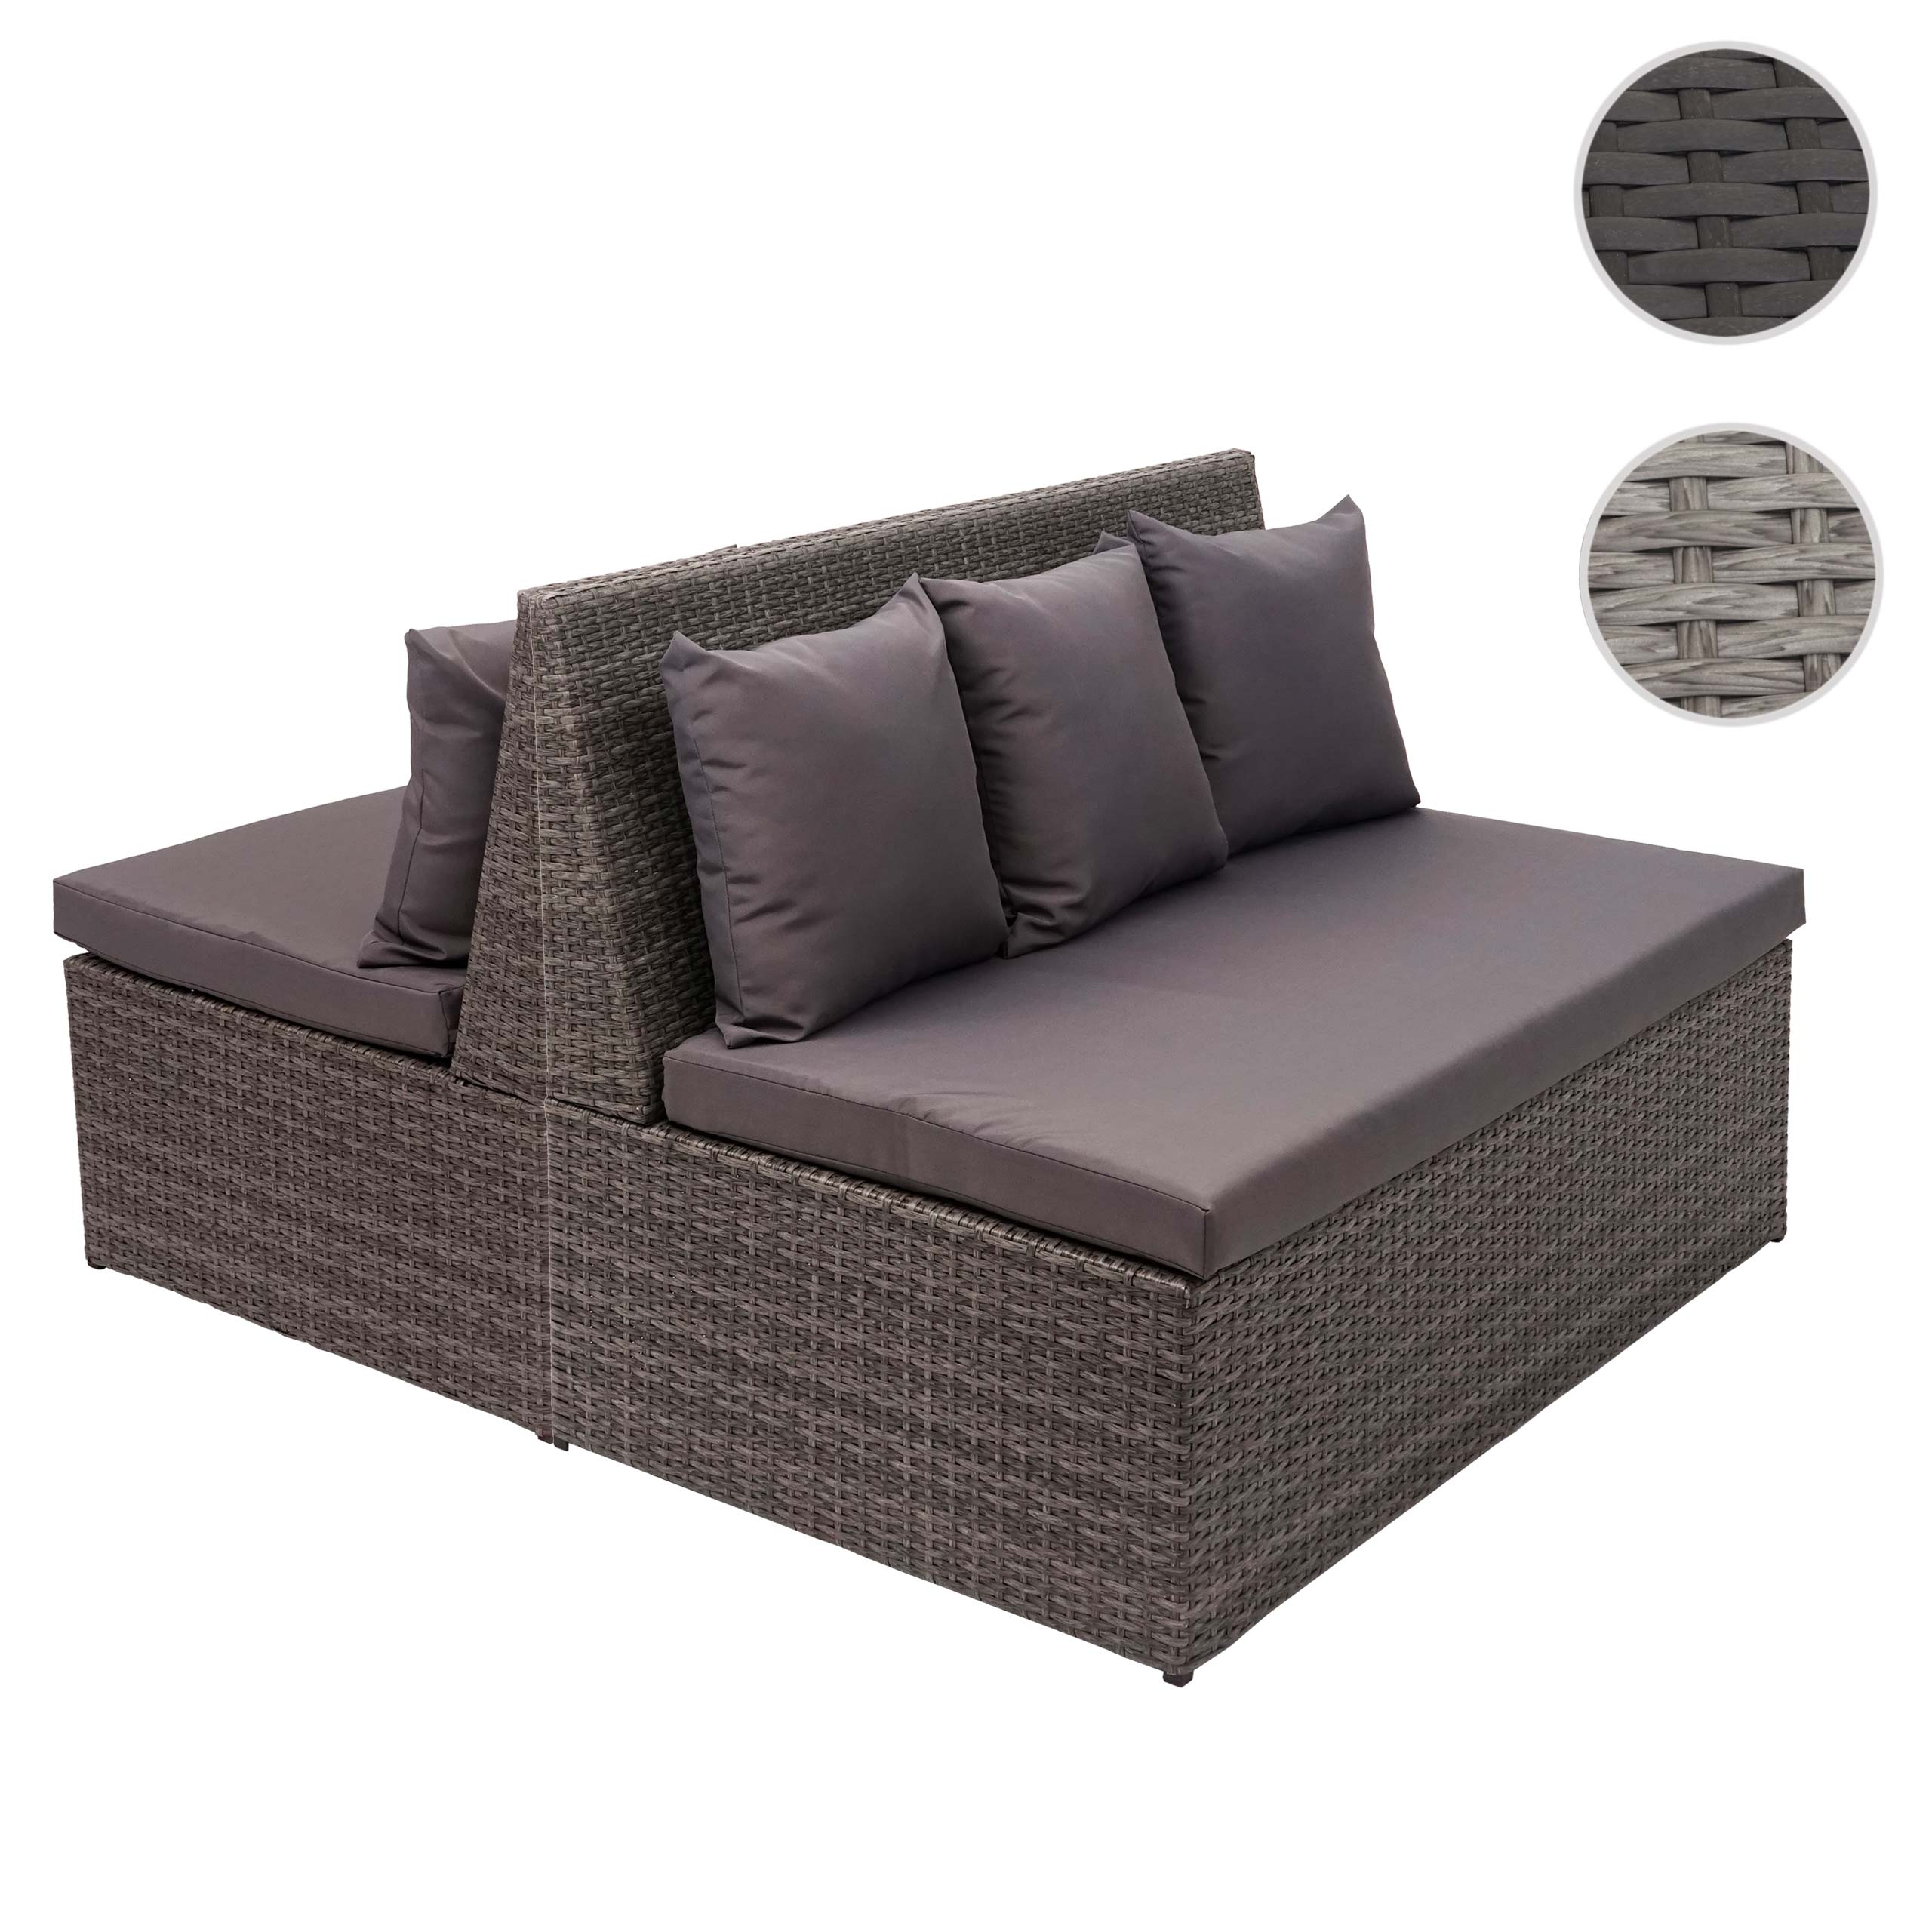 Mendler 2x Poly-Rattan 2er Sofa HWC-G16, Lounge-Gartenbank Sitzbank Sessel, Gastronomie 120cm ~ Variantenang 2x70868